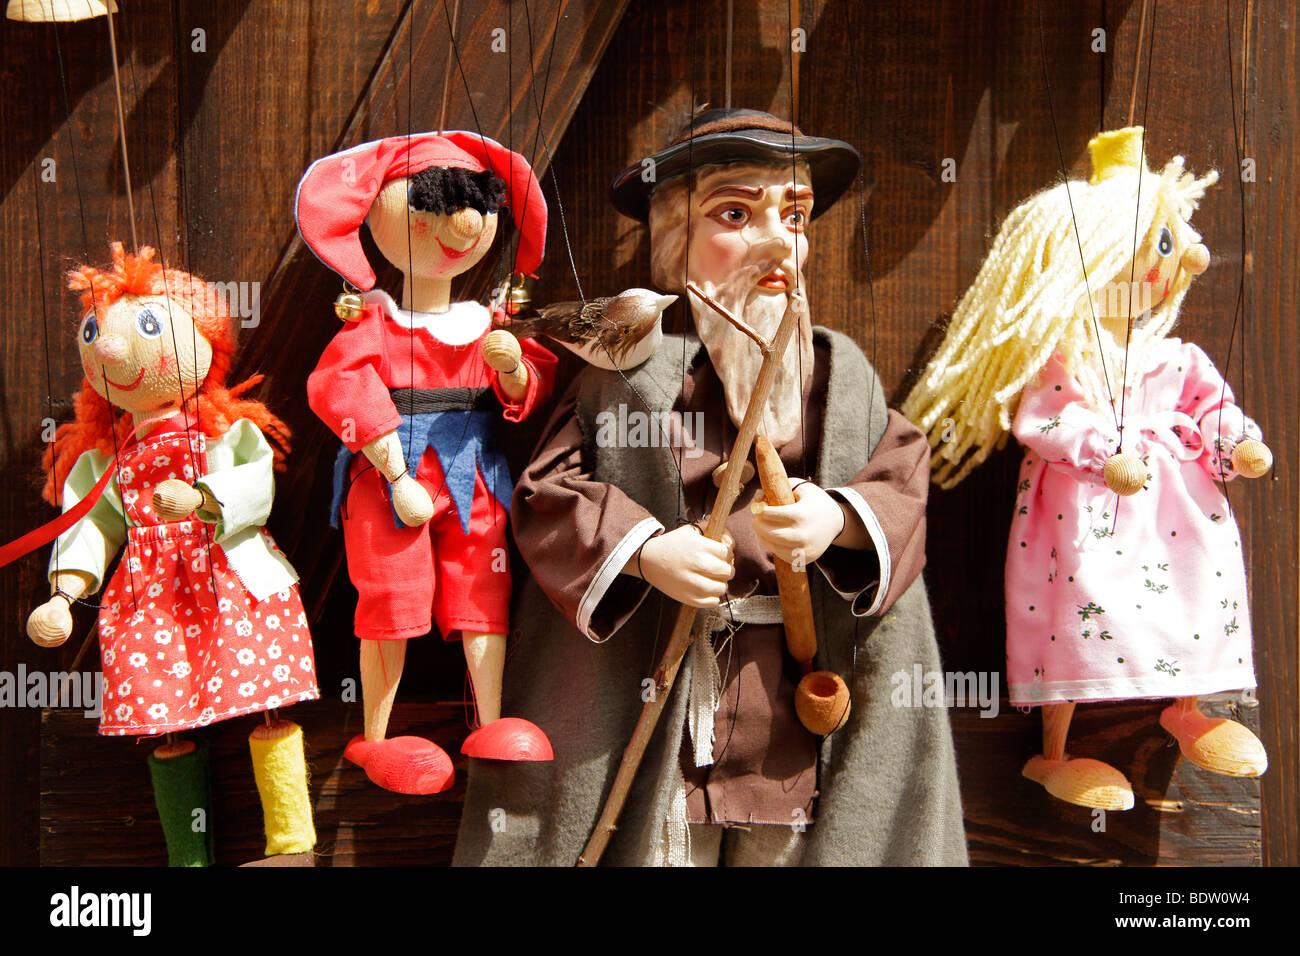 puppets on a string in a souvenir shop in Cesk Krumlov, Czech Republic, Europe - Stock Image